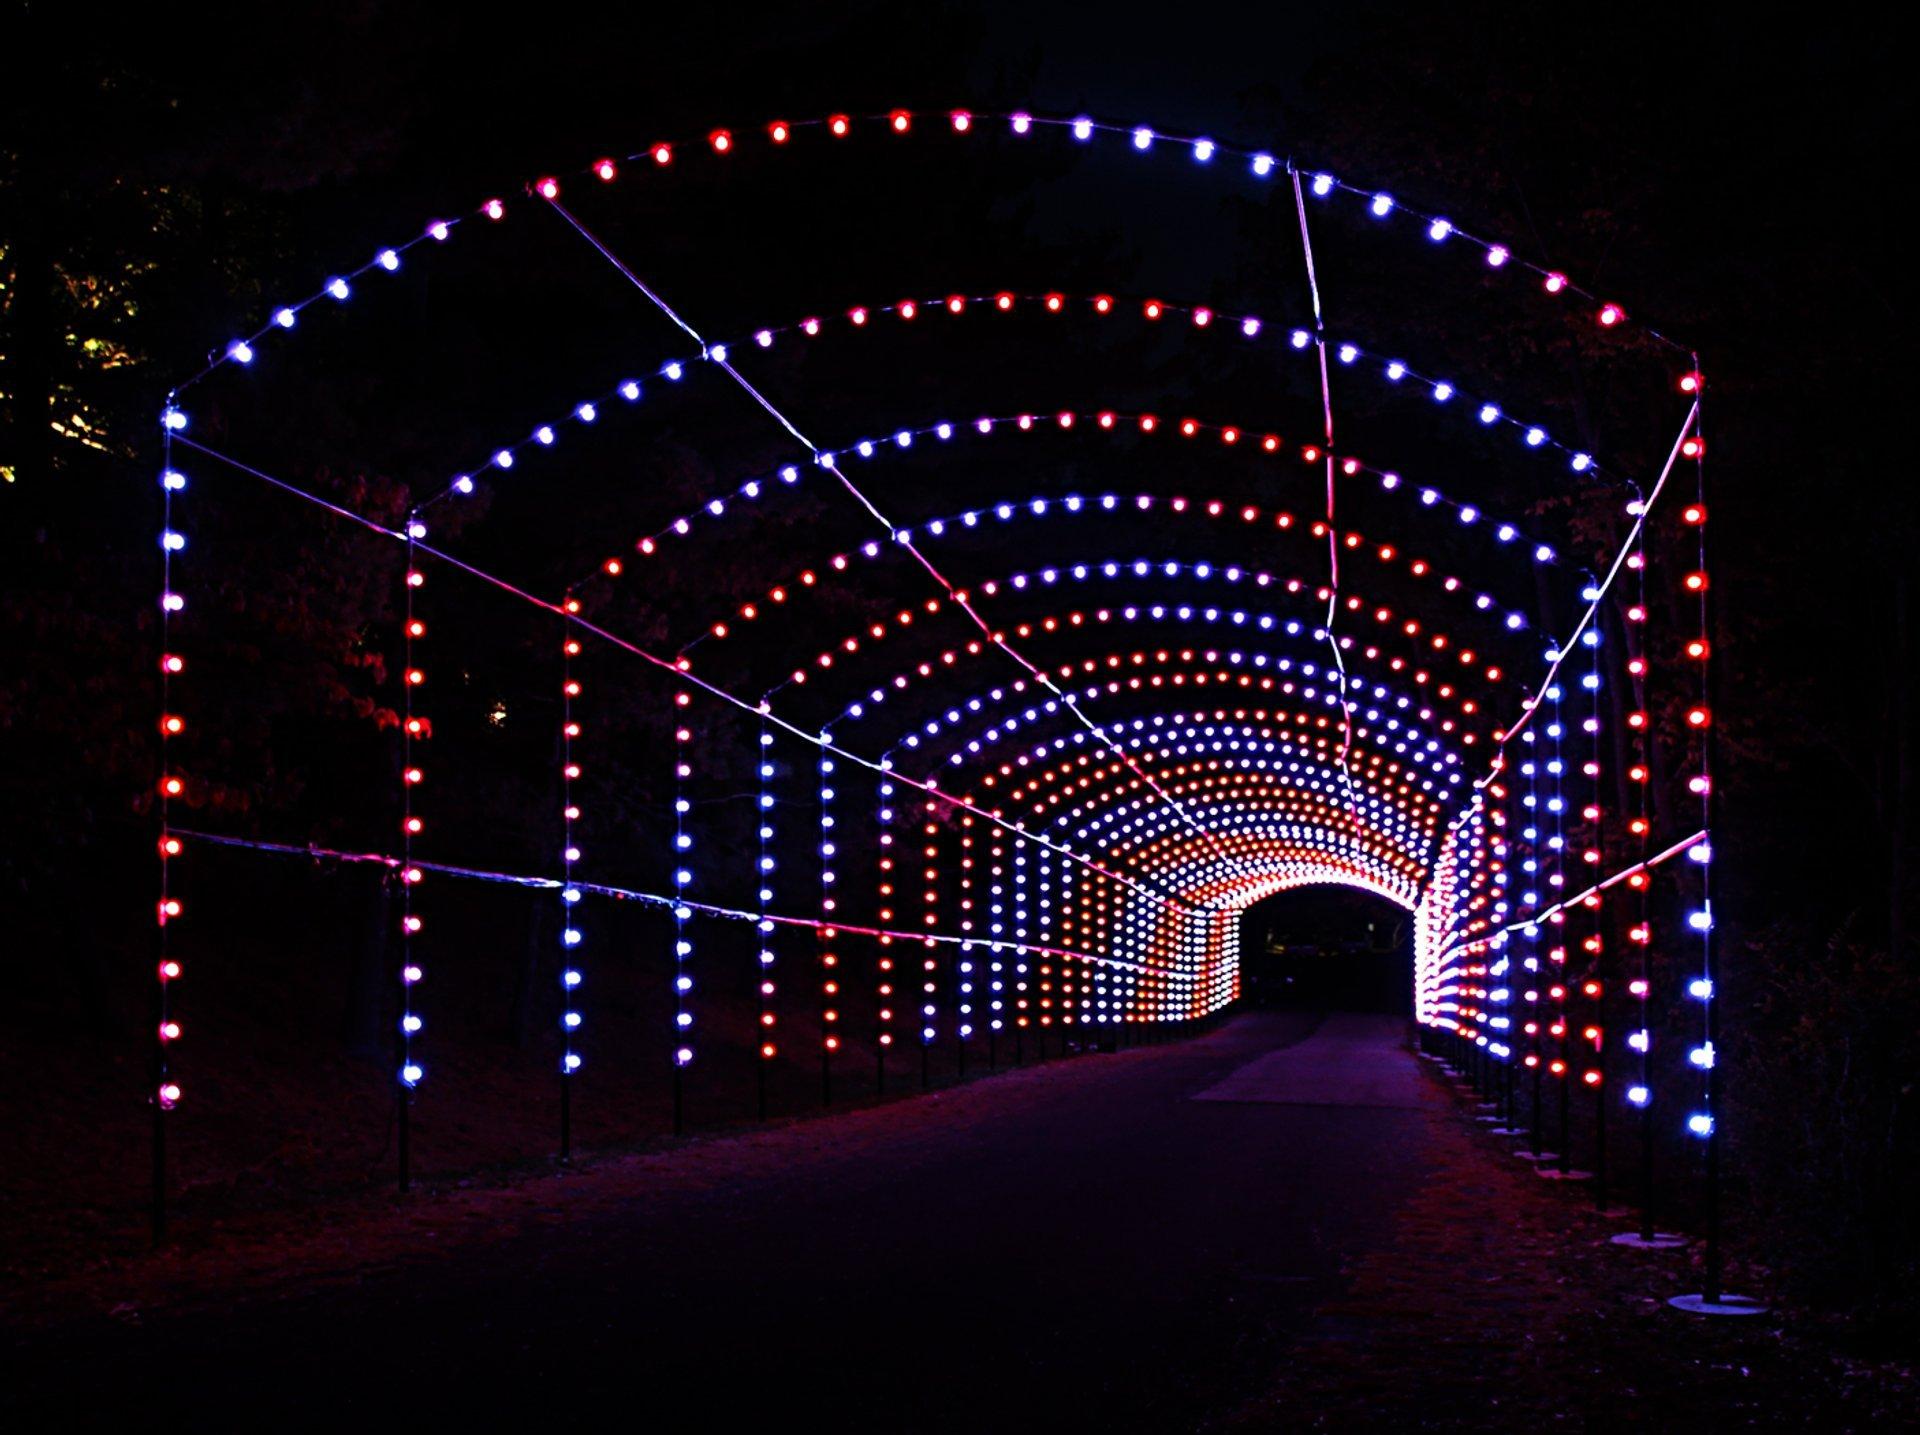 Best time for Oglebay Winter Festival of Lights 2020